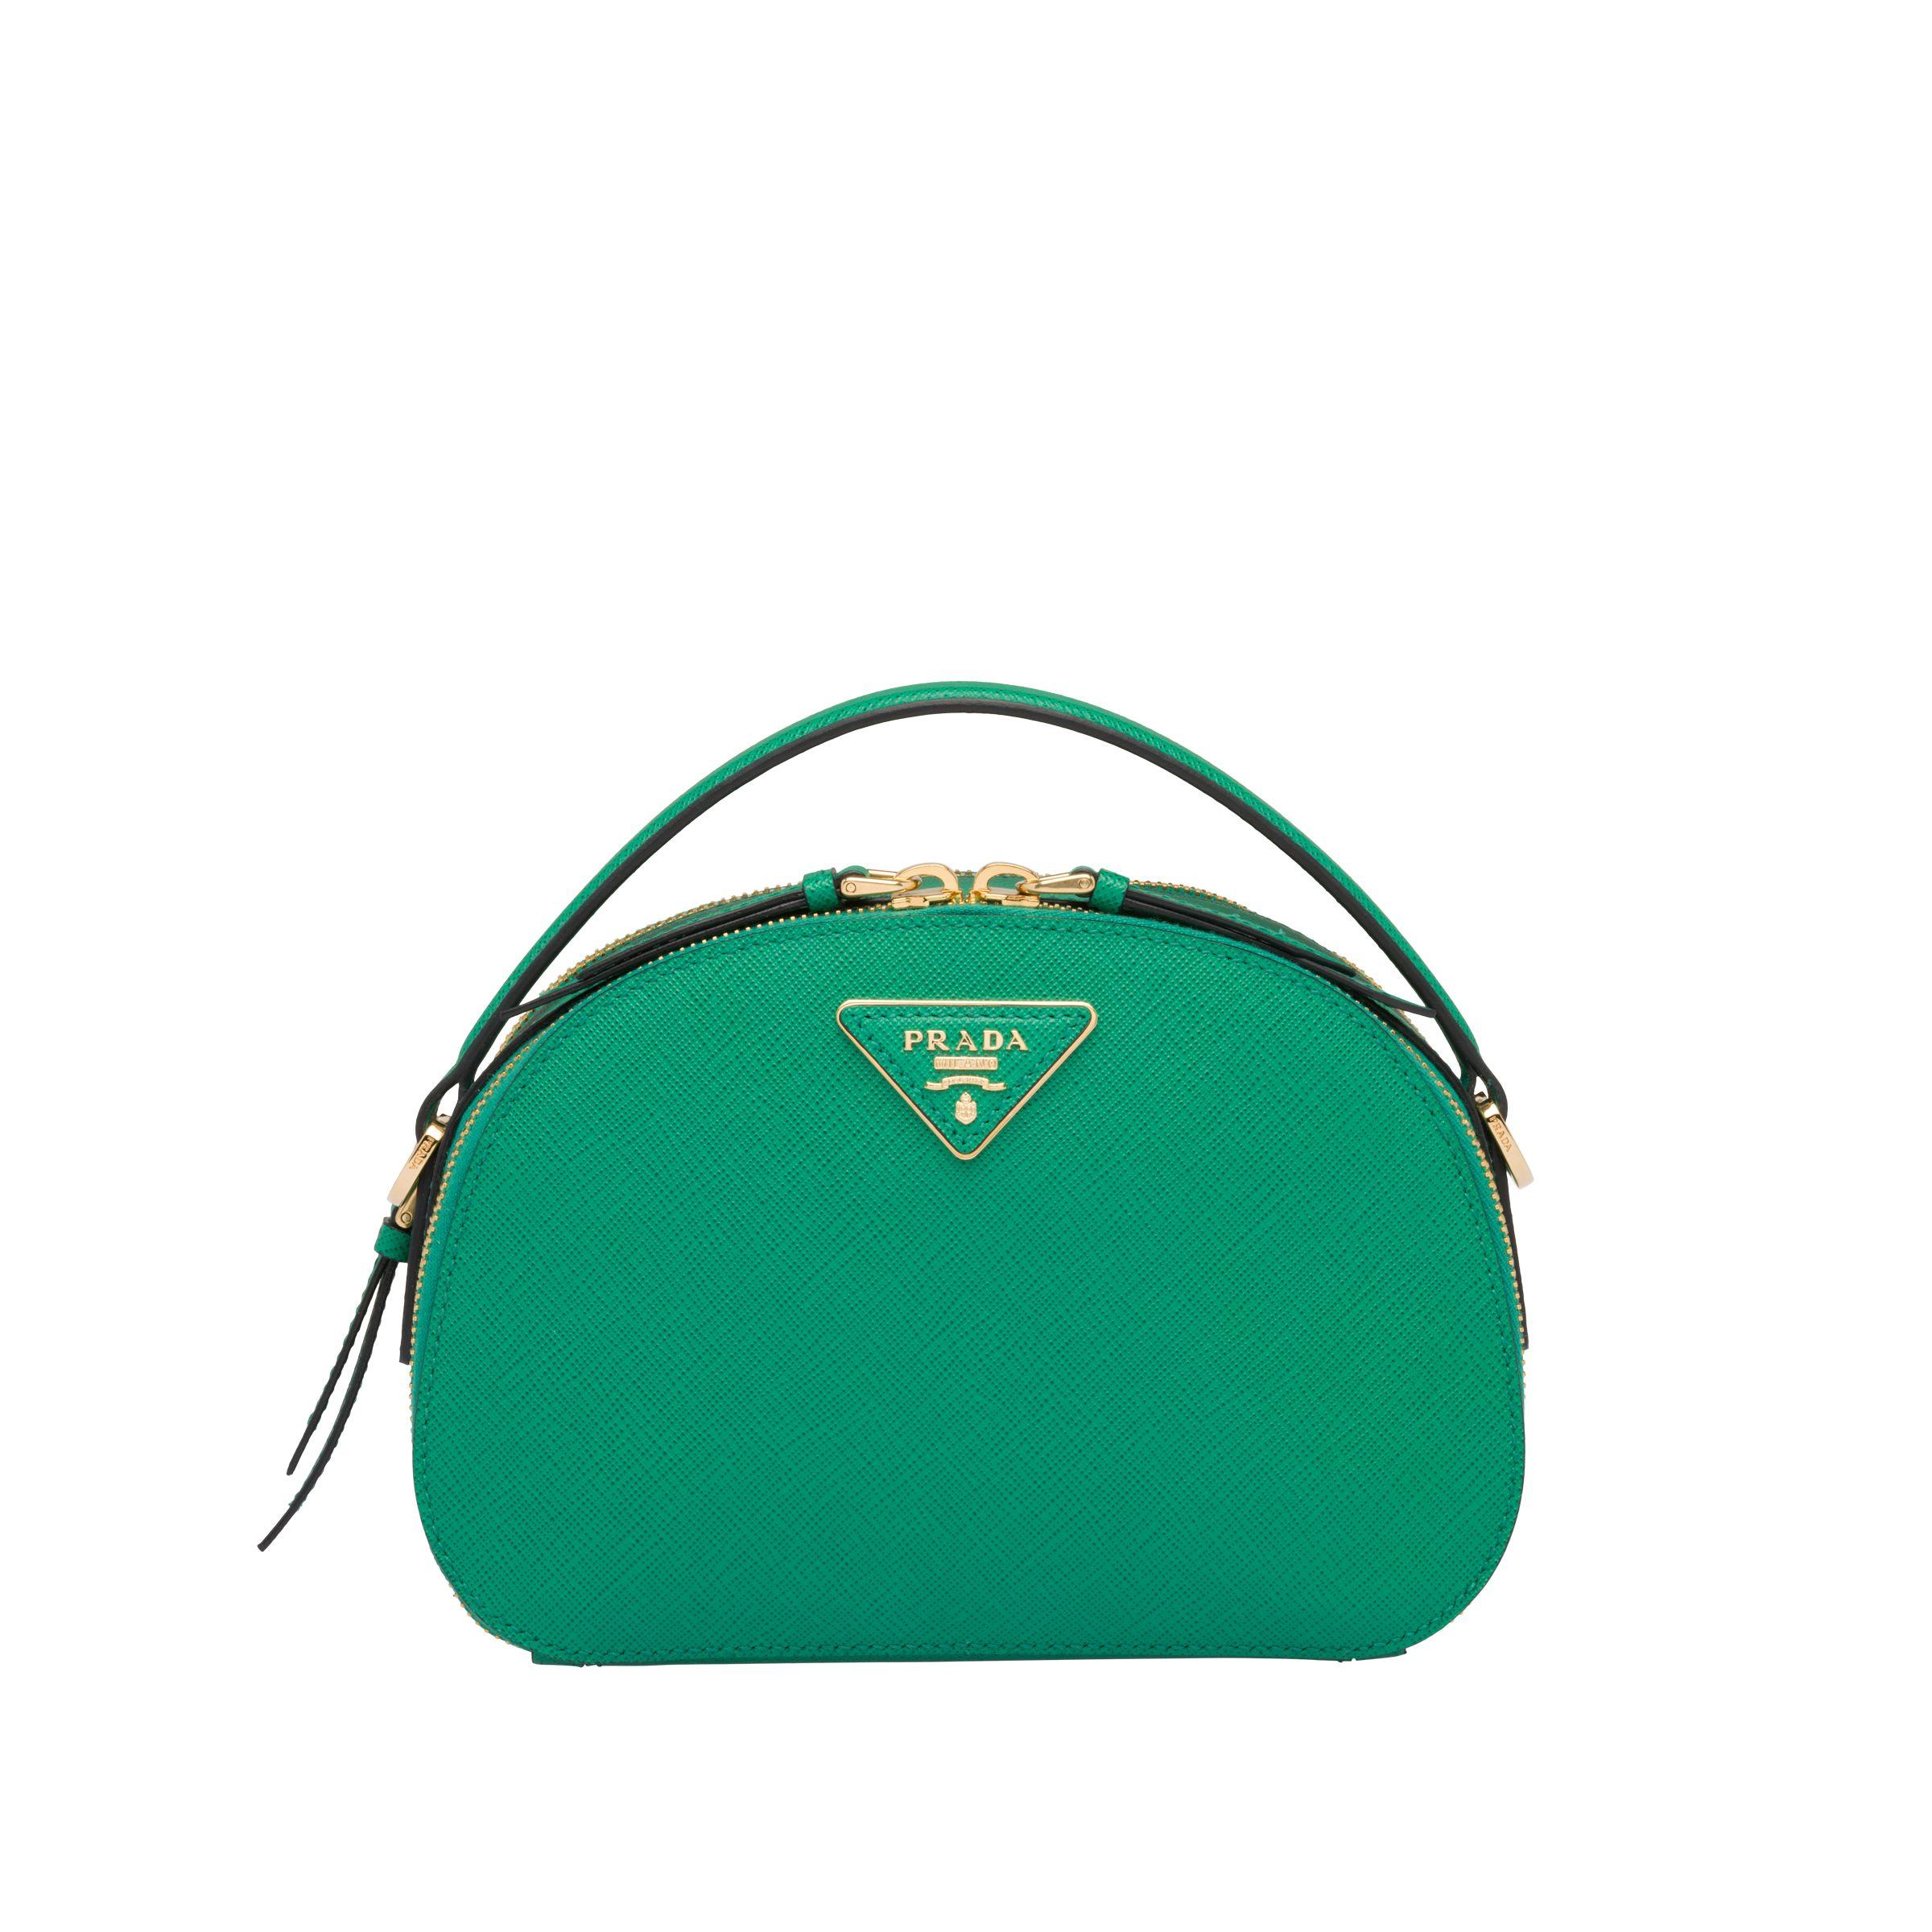 Borsa a tracolla Prada verde smeraldo Odette a 1,500 euro